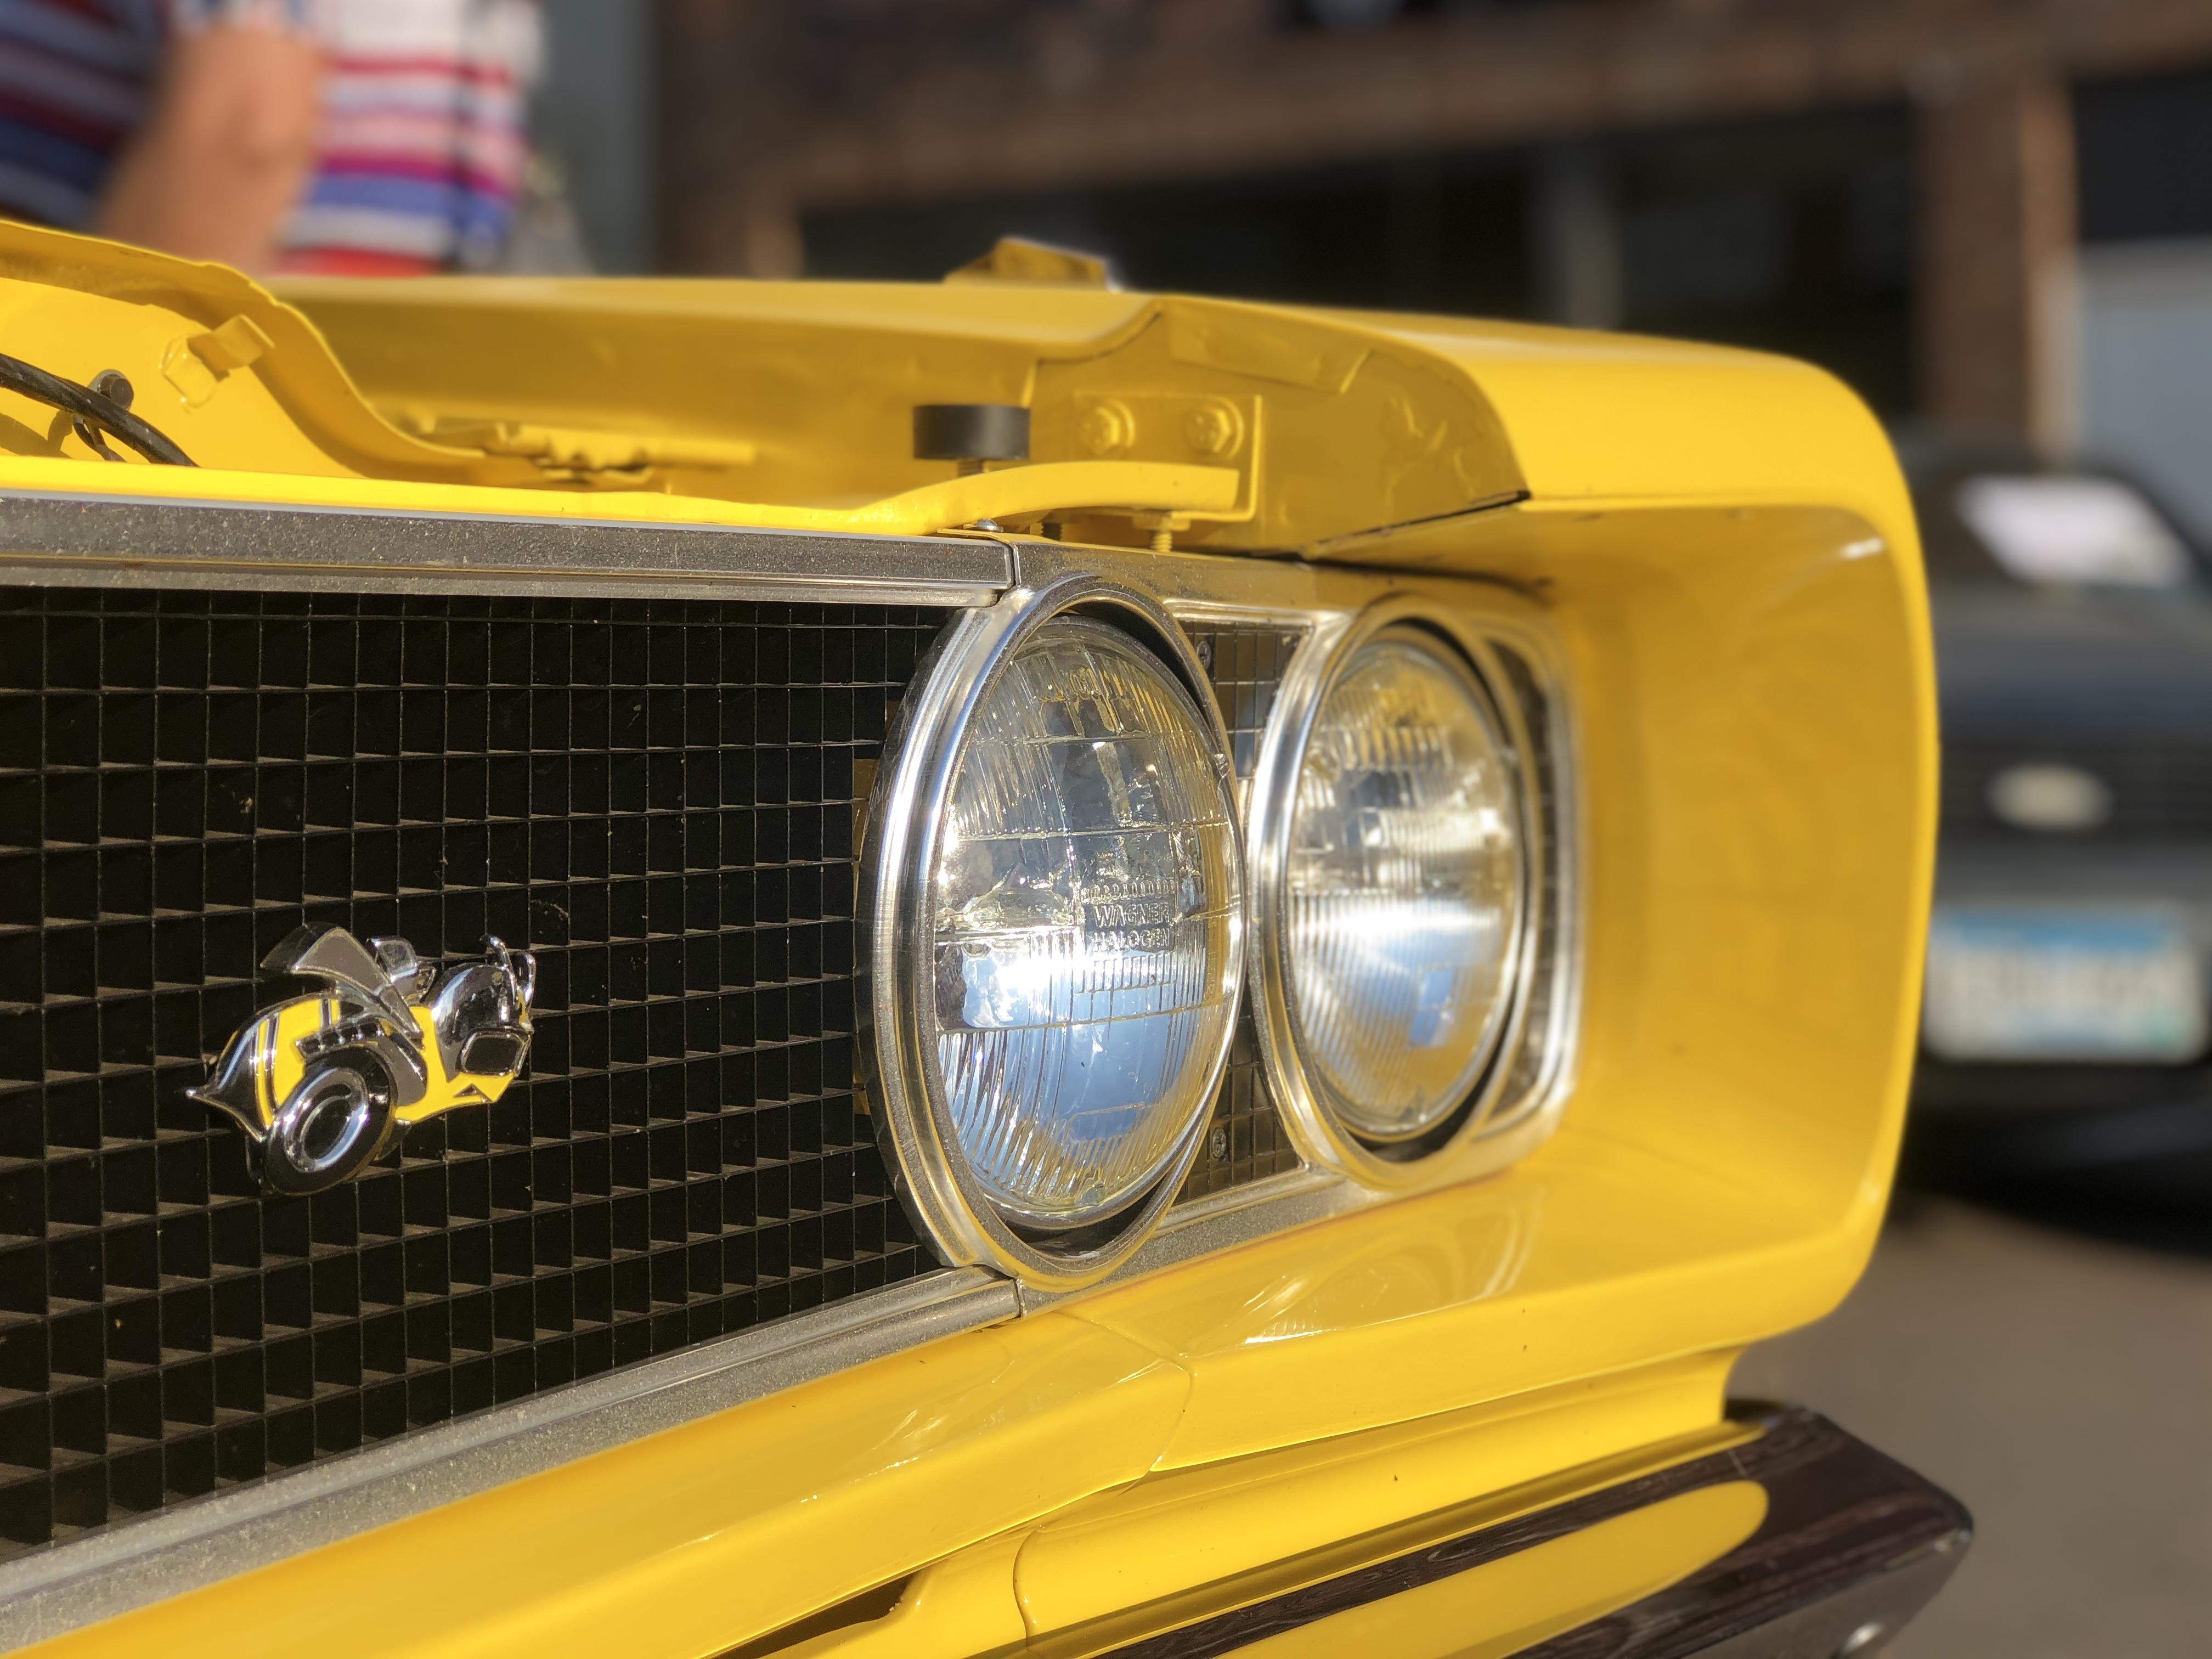 Super Bee Headlights (photo by Erica Volkir)